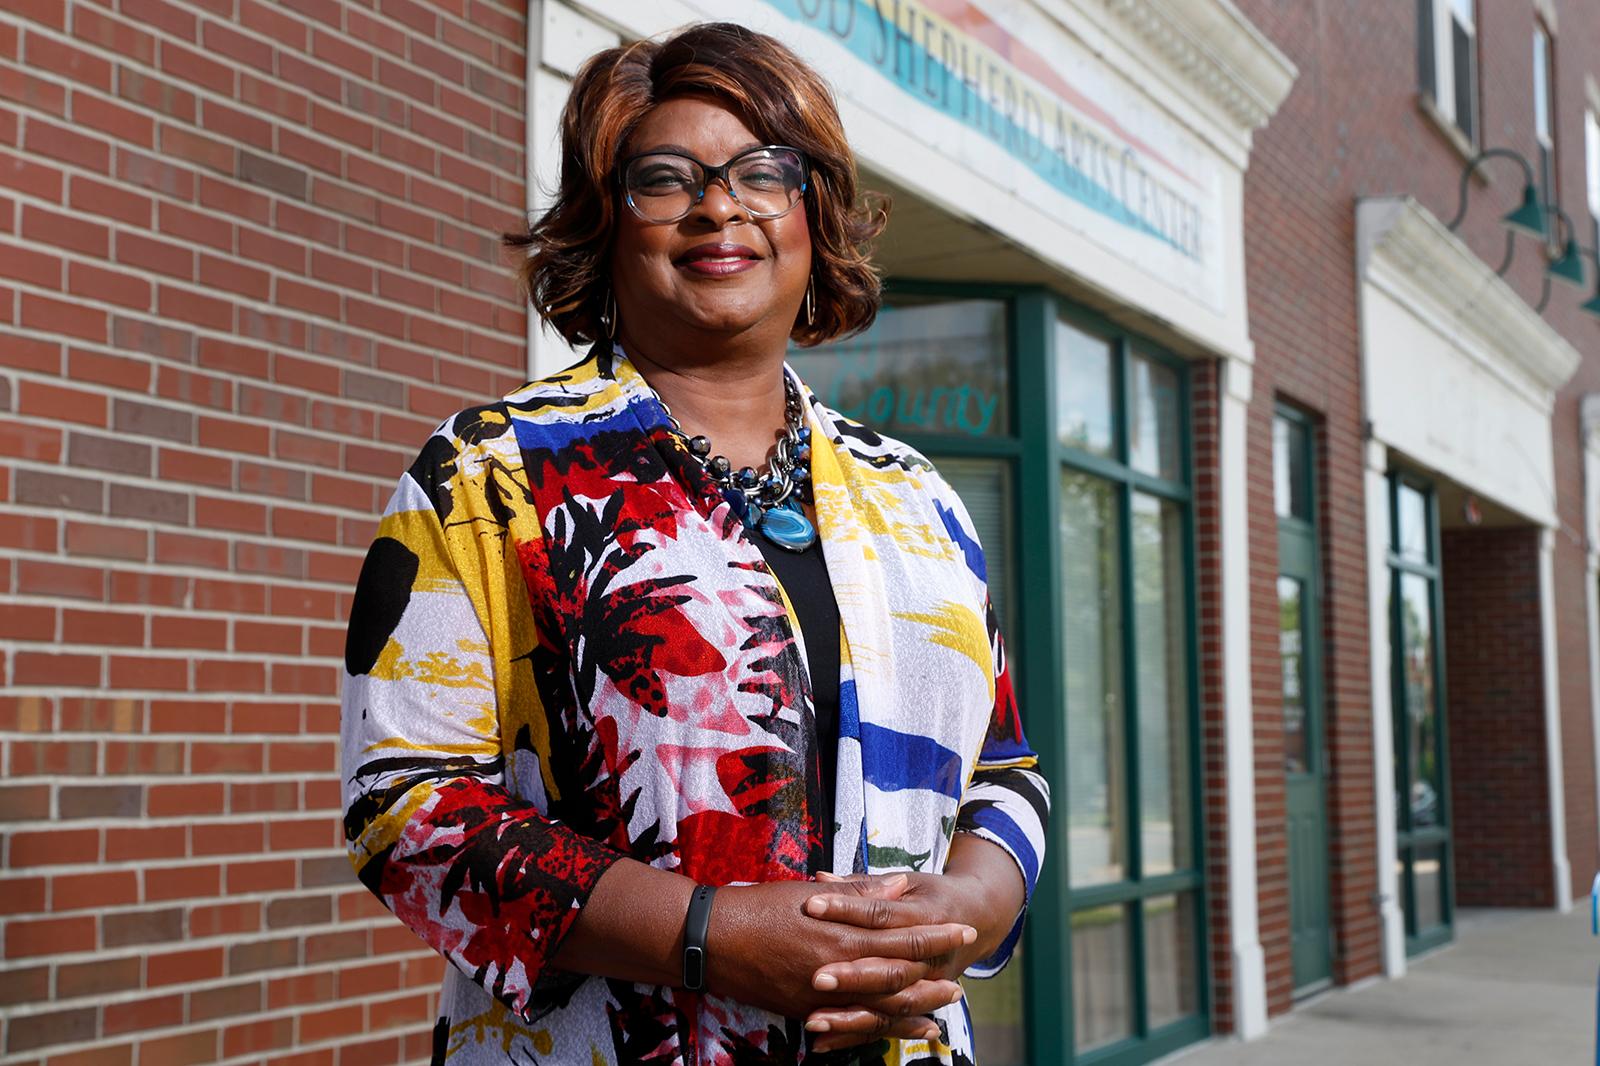 Mayor Ella Jones poses for a photo on June 3, in Ferguson, Missouri.